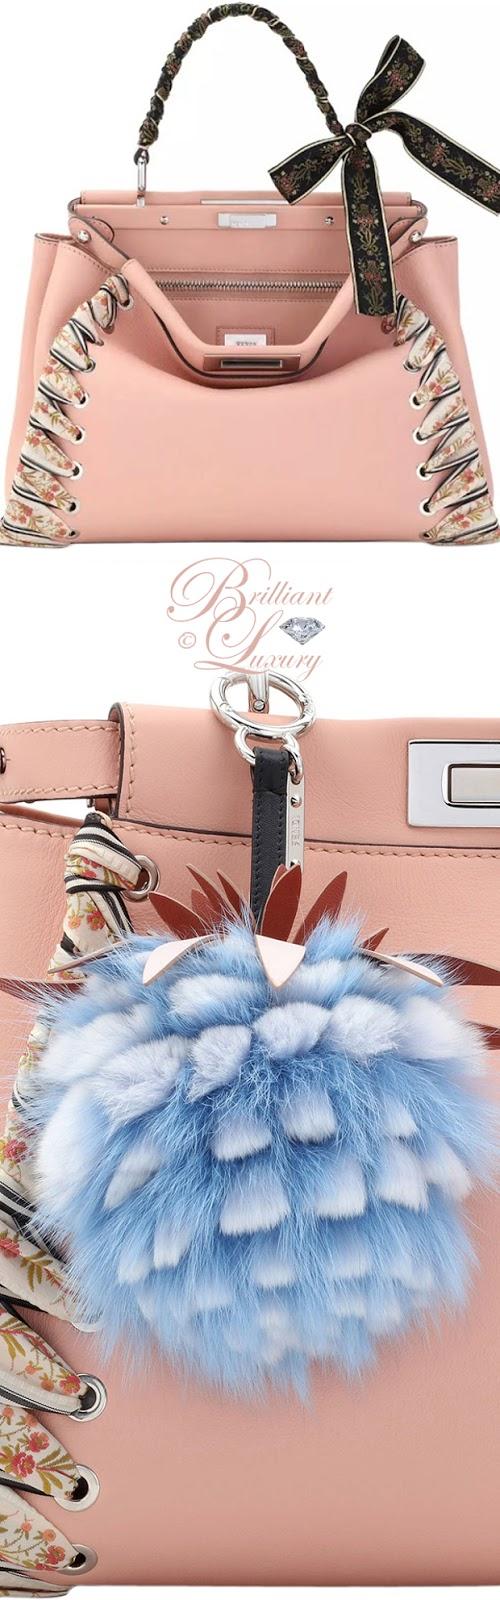 Brilliant Luxury ♦ Fendi Peekaboo Medium Ribbon Whipstitch Satchel Bag in Light Pink